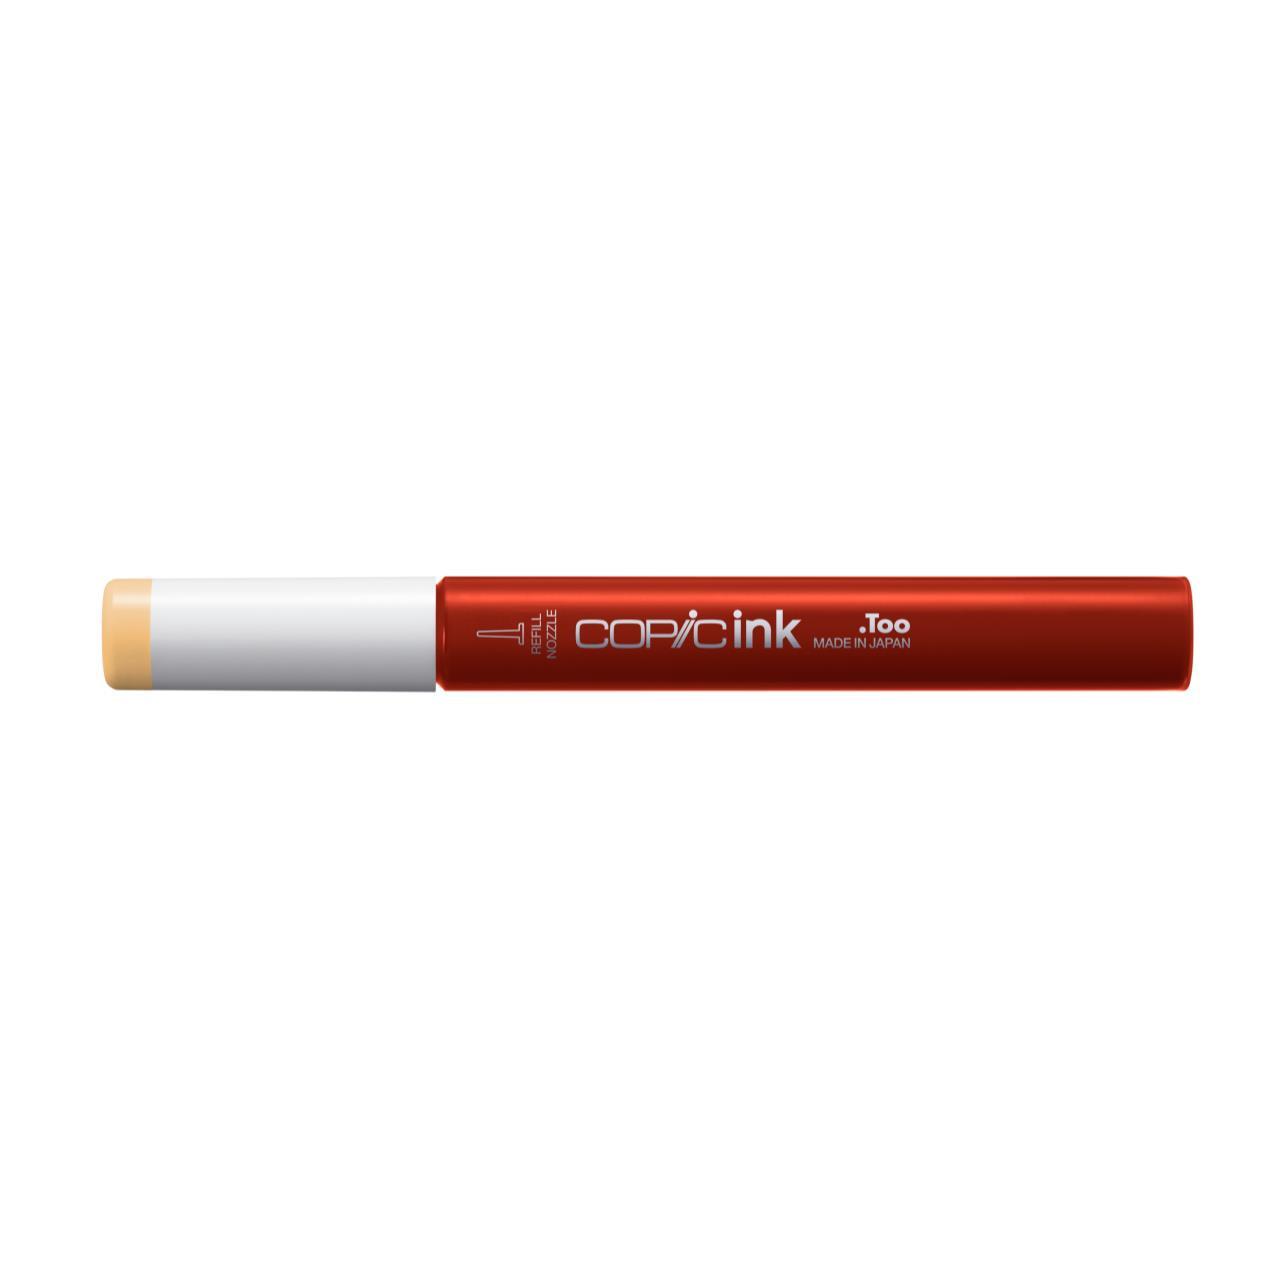 YR21 Cream, Copic Ink - 4511338058718